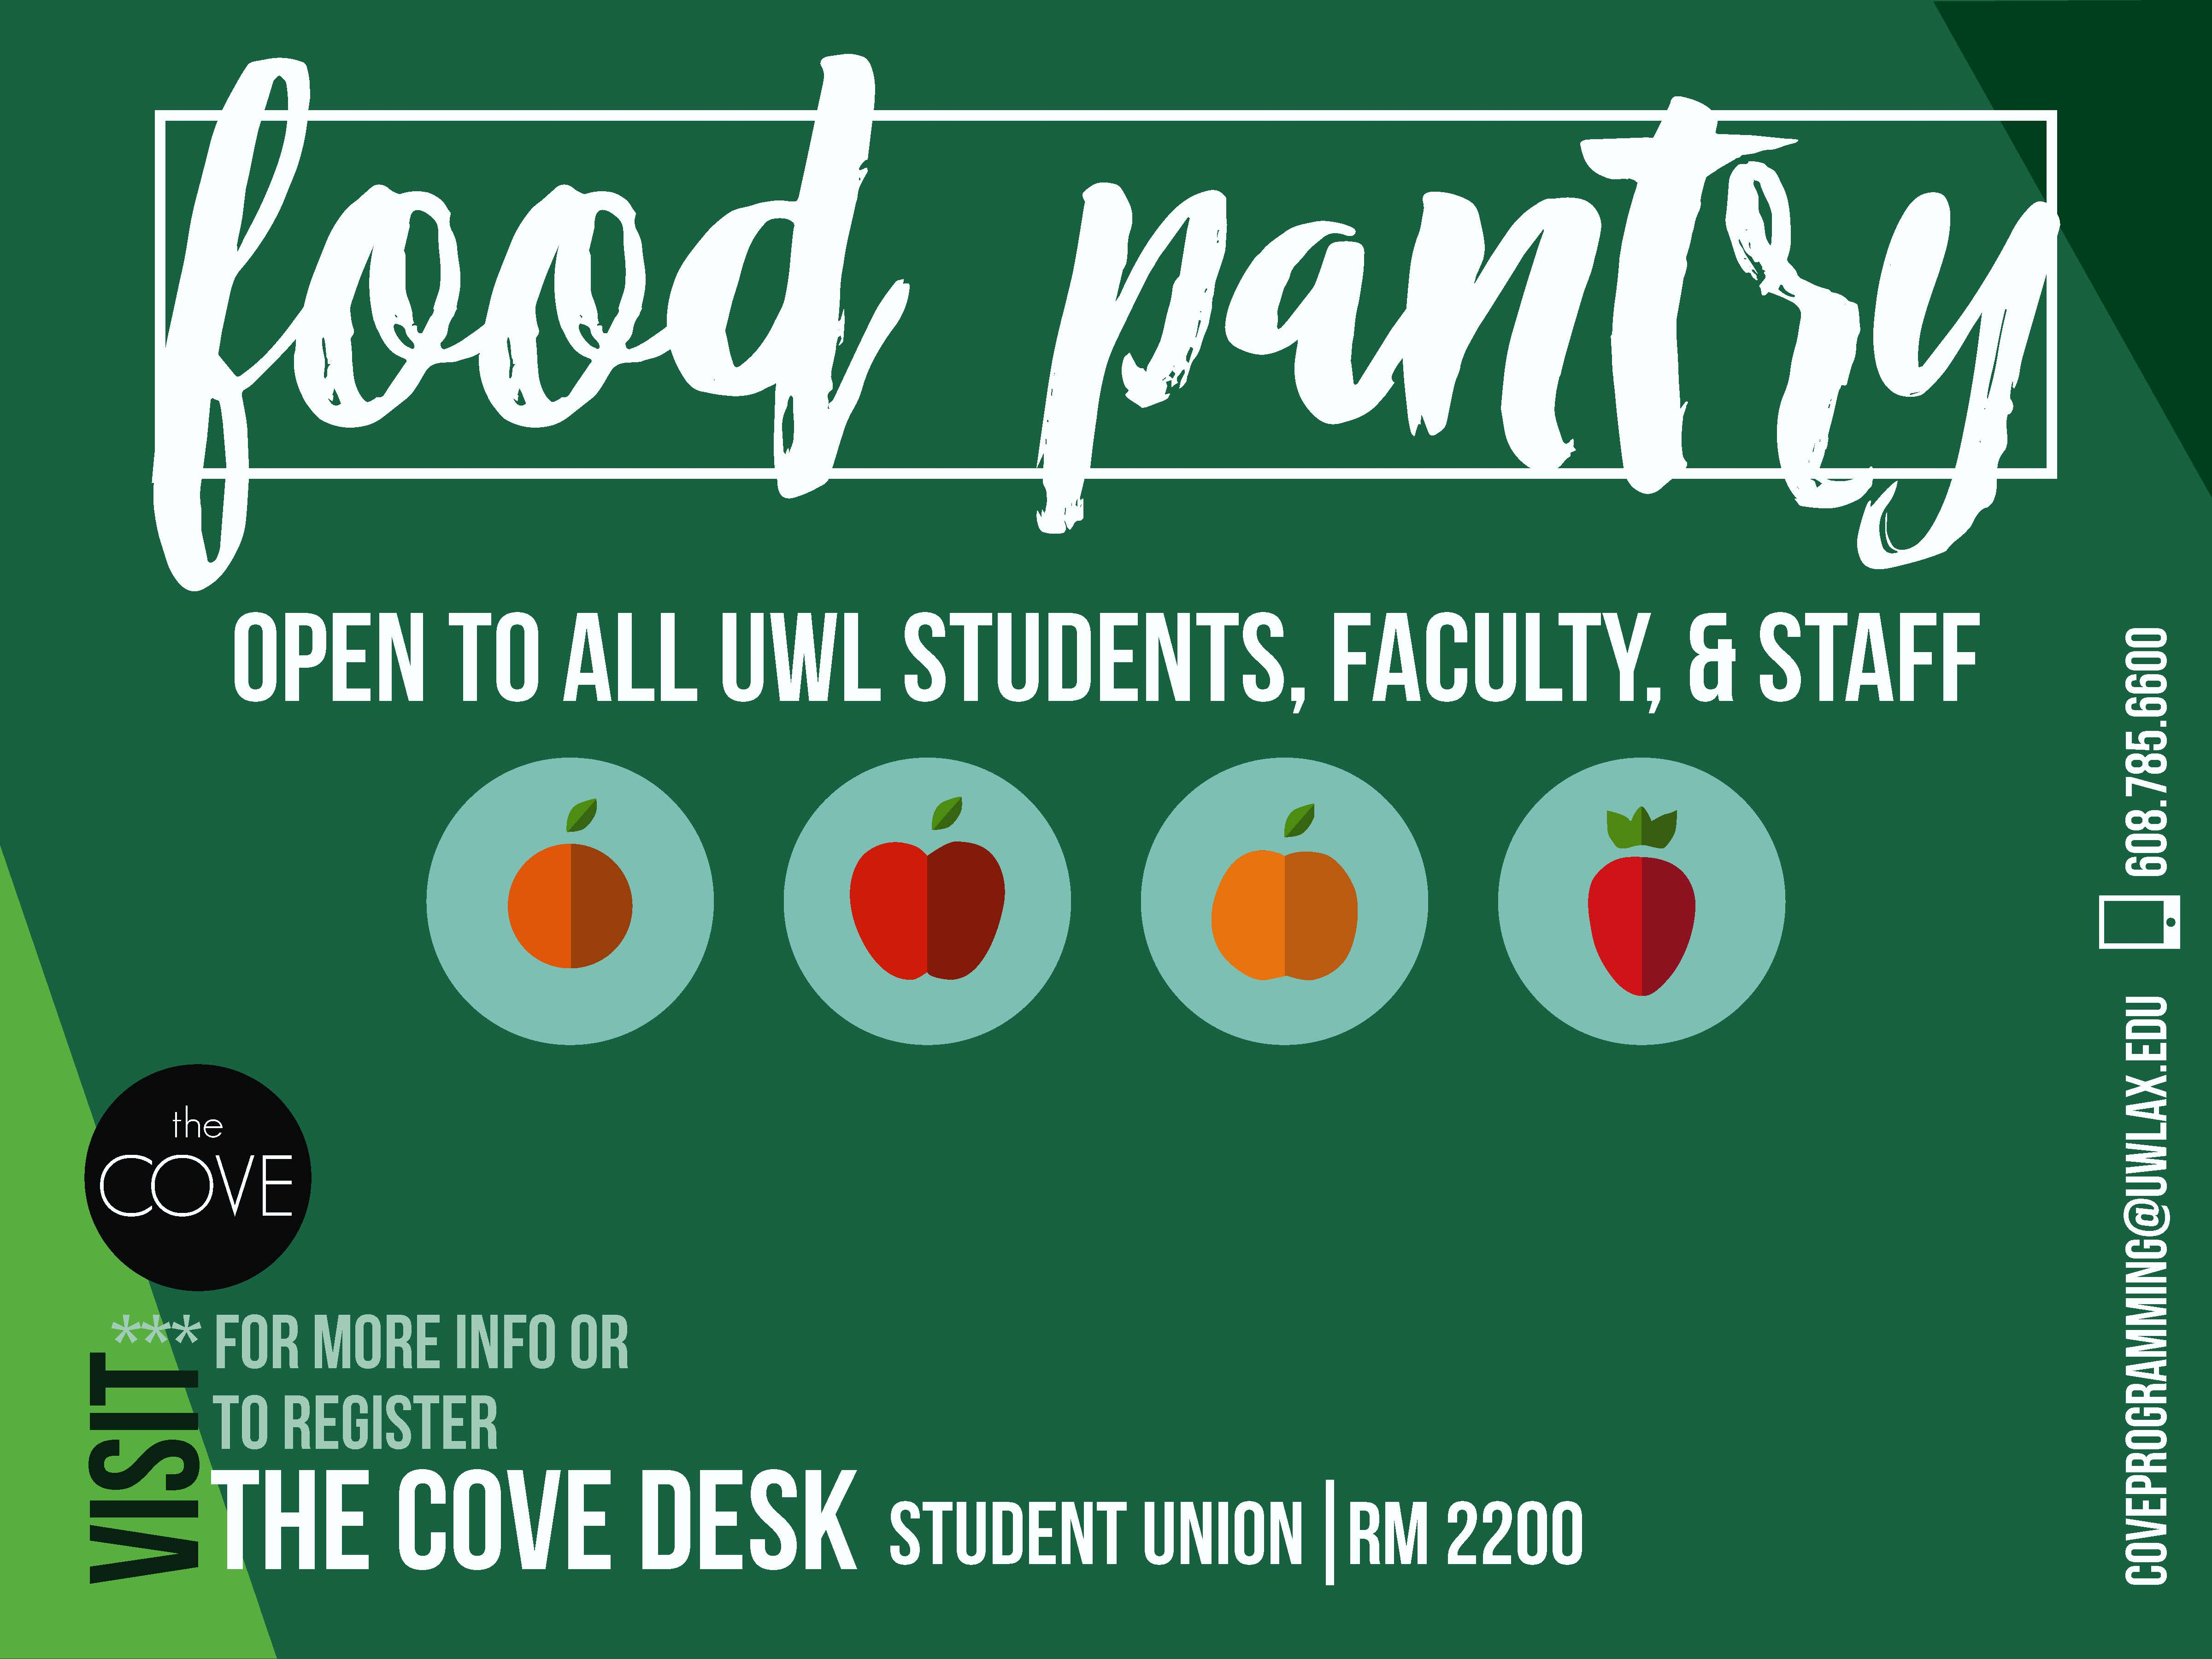 Campus Food Pantry